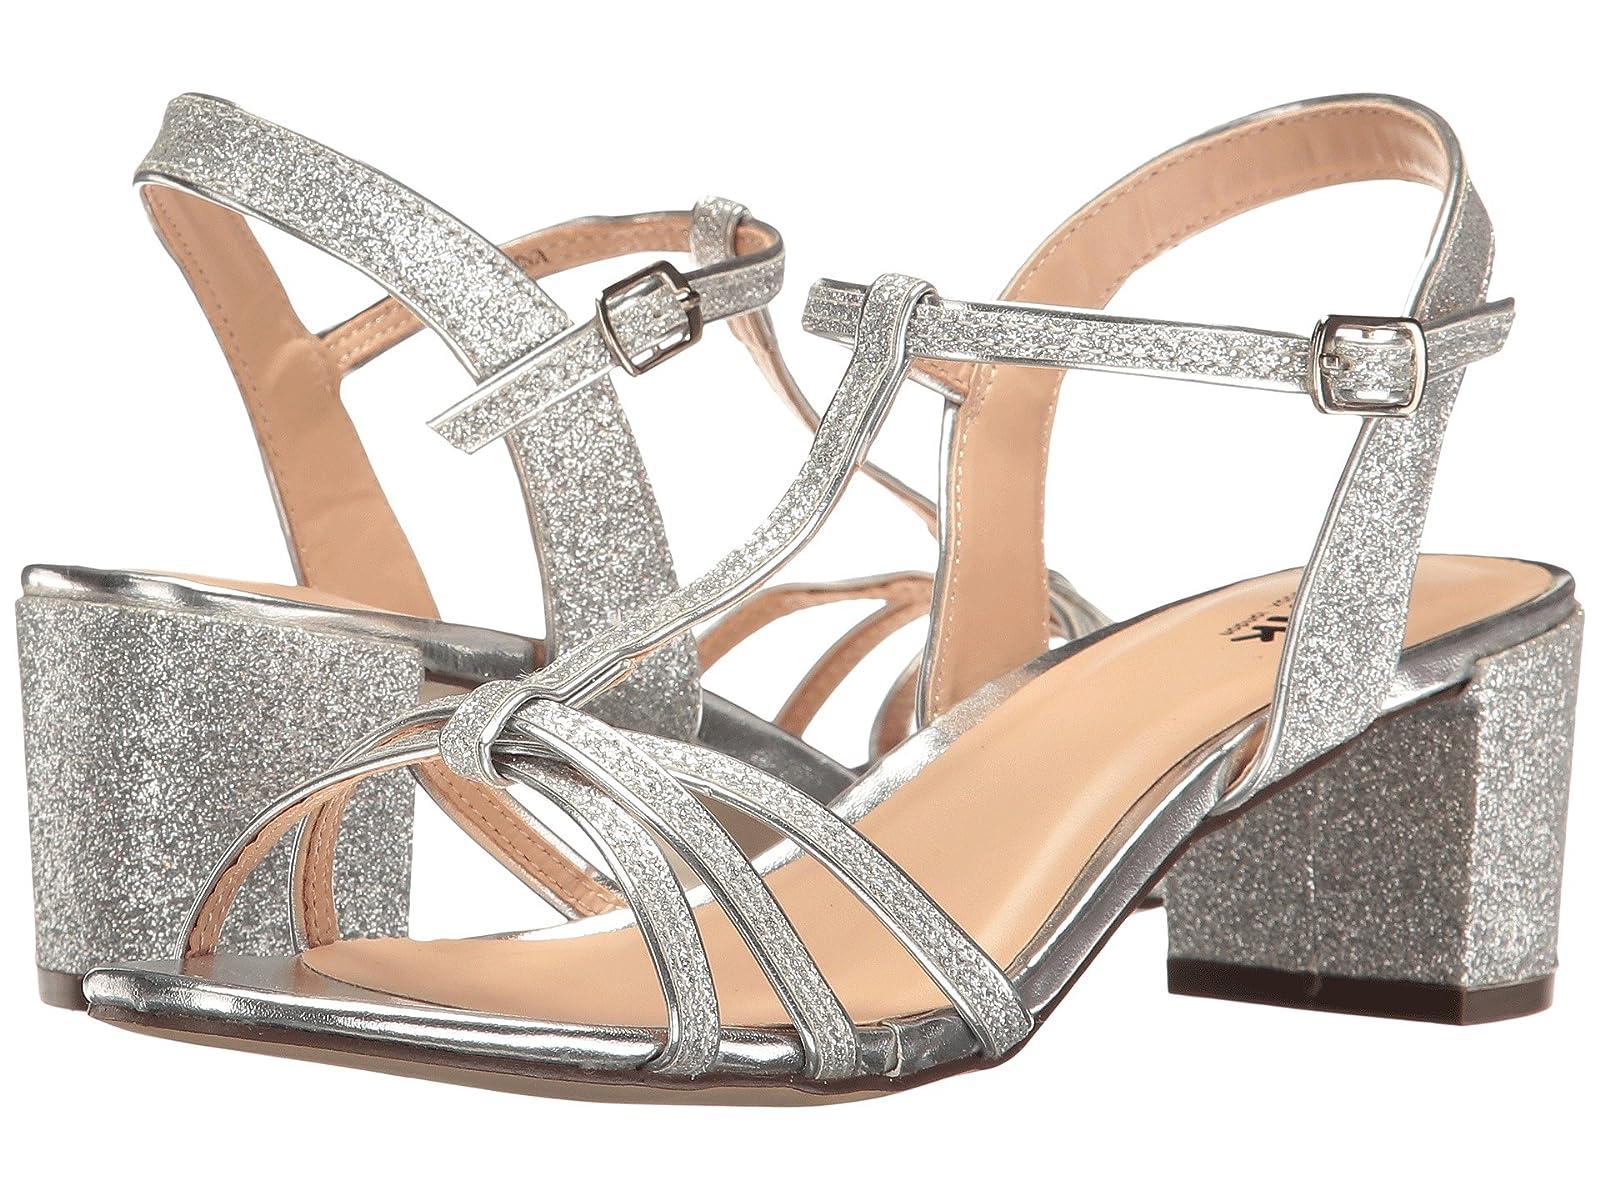 Paradox London Pink SadieCheap and distinctive eye-catching shoes